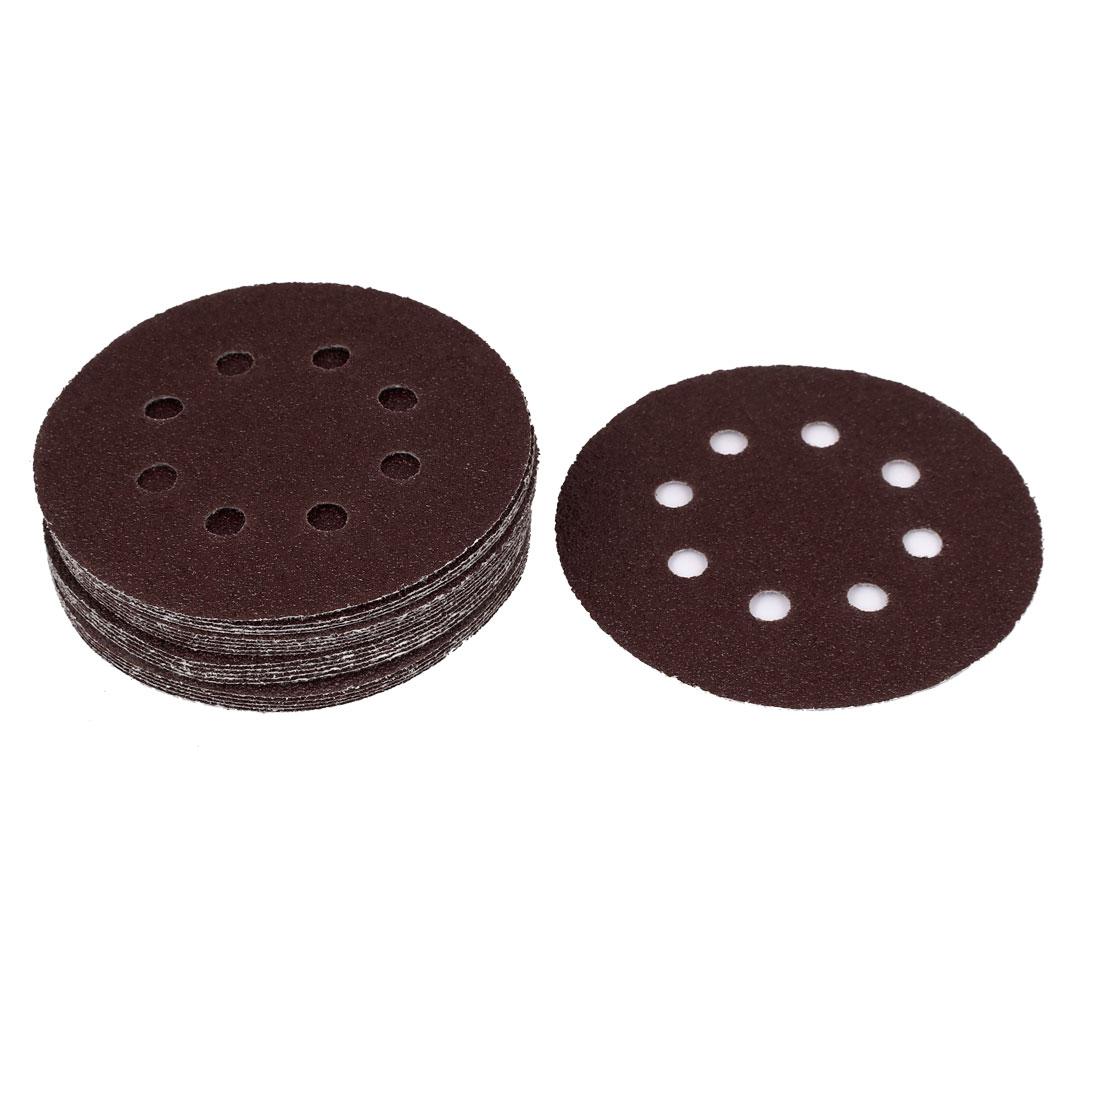 "5"" Dia 40 Grit Abrasives Hook and Loop Back Sandpaper Discs Dark Brown 20 Pcs"